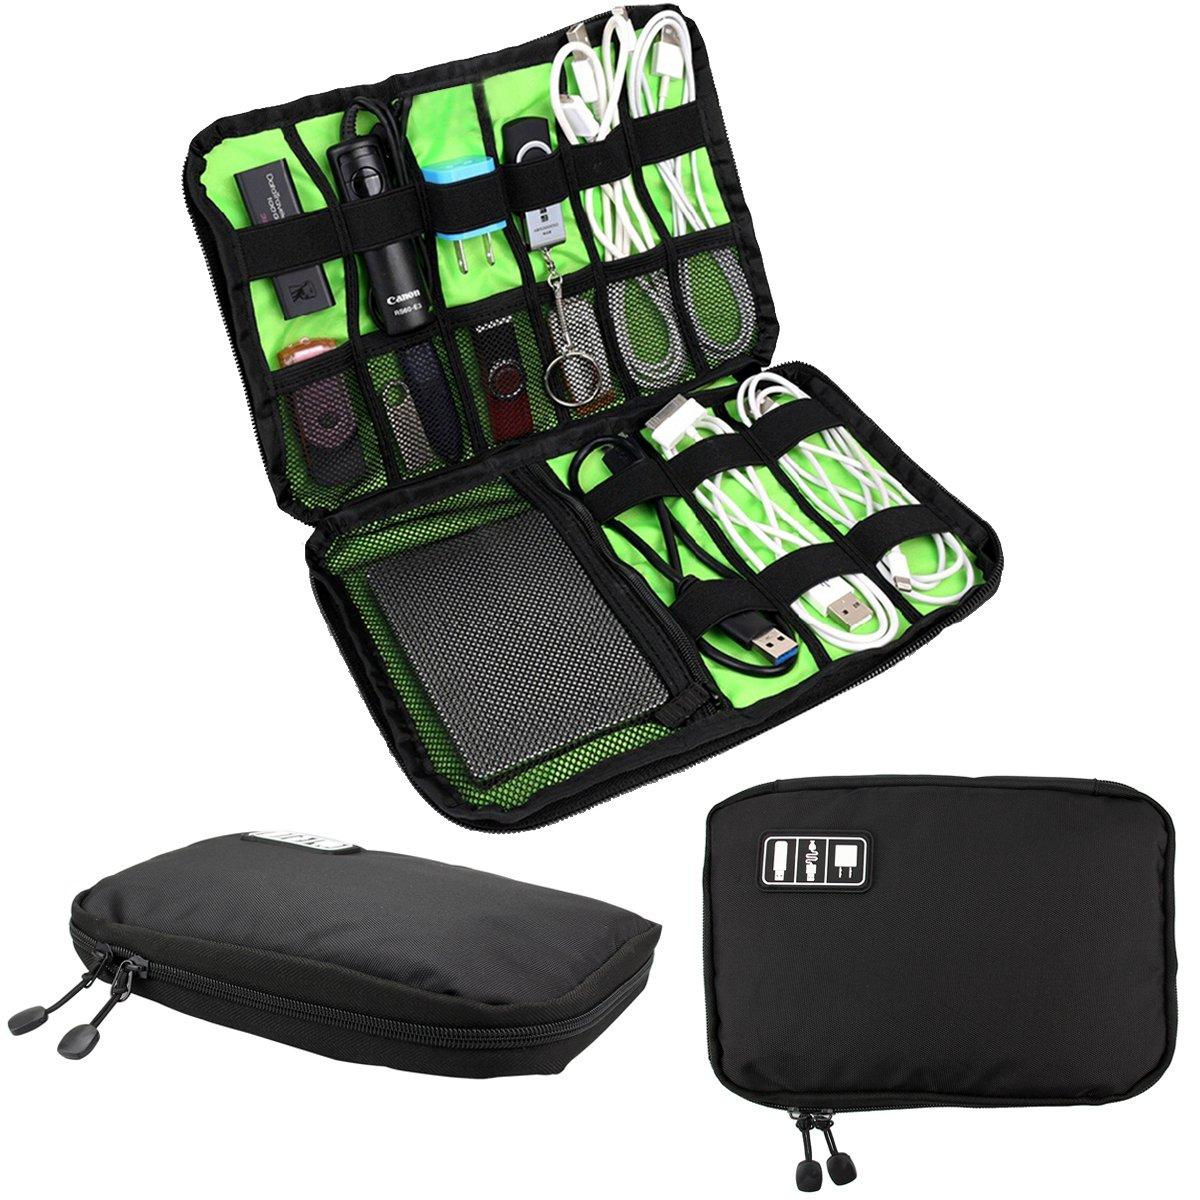 Chic Runfon Cable Organizer Electronics Accessories Travel Bag Sounder Sensor Trigger Drum Disc Plus Wire Copper Piezo Elements 27mm Hard Drive Case For Usb